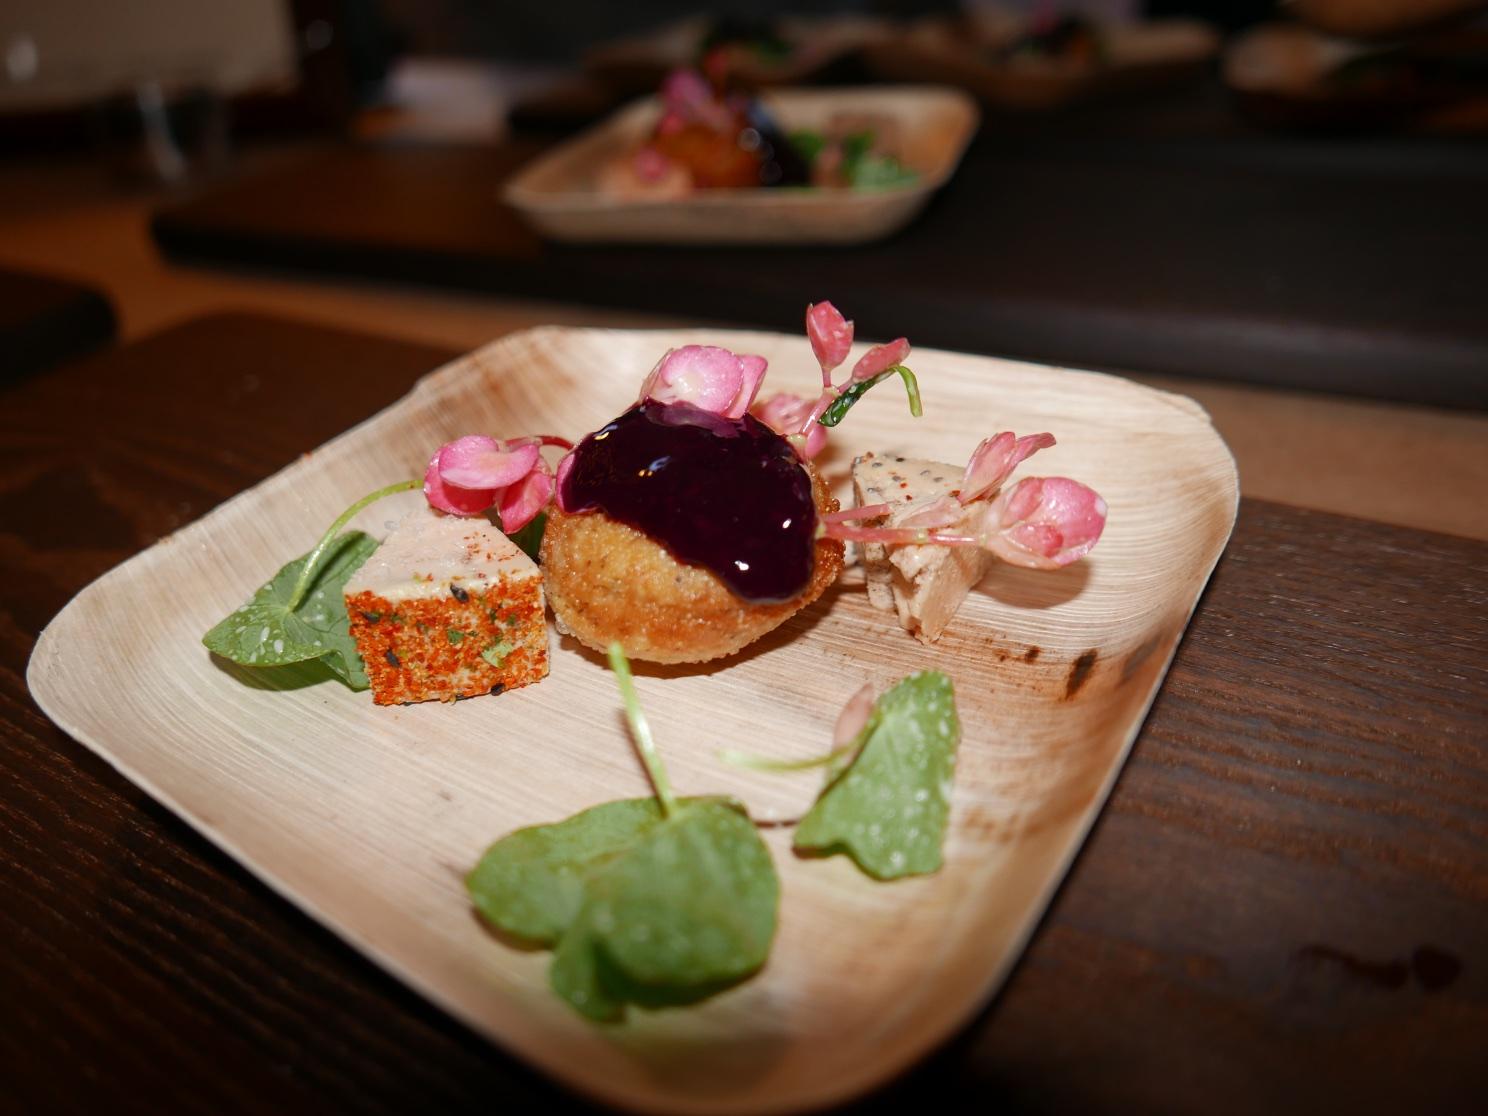 Foie Gras, Jalapeño-Blueberry Jam, and Cheddar Doughnuts by Greg Biggers of Cafe des Architectes